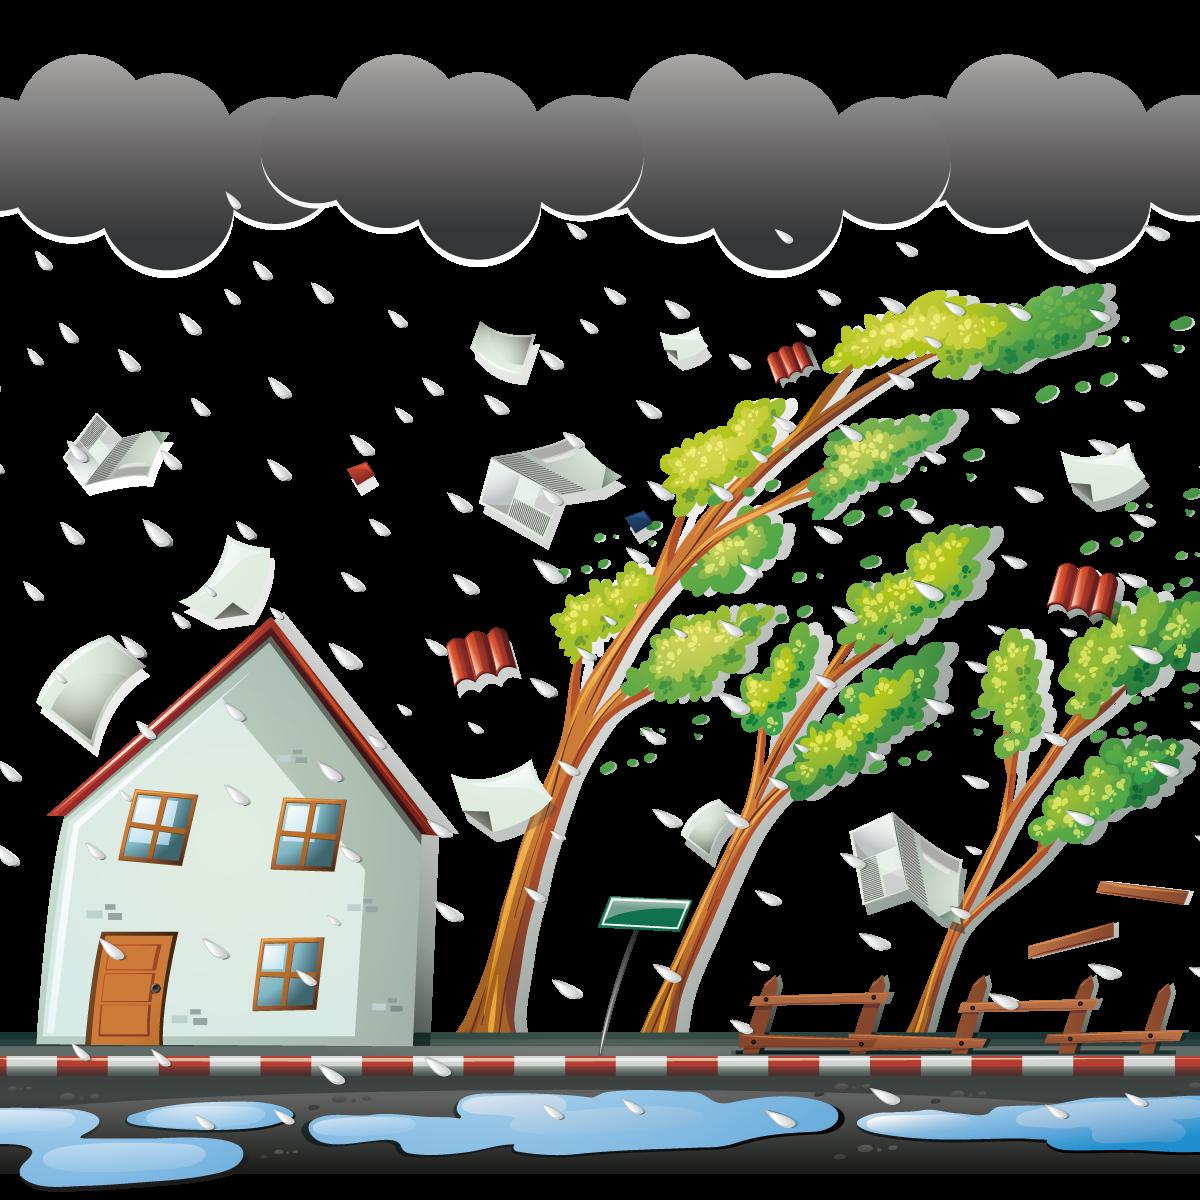 Windy clipart winter wind. Thunderstorm clip art vector